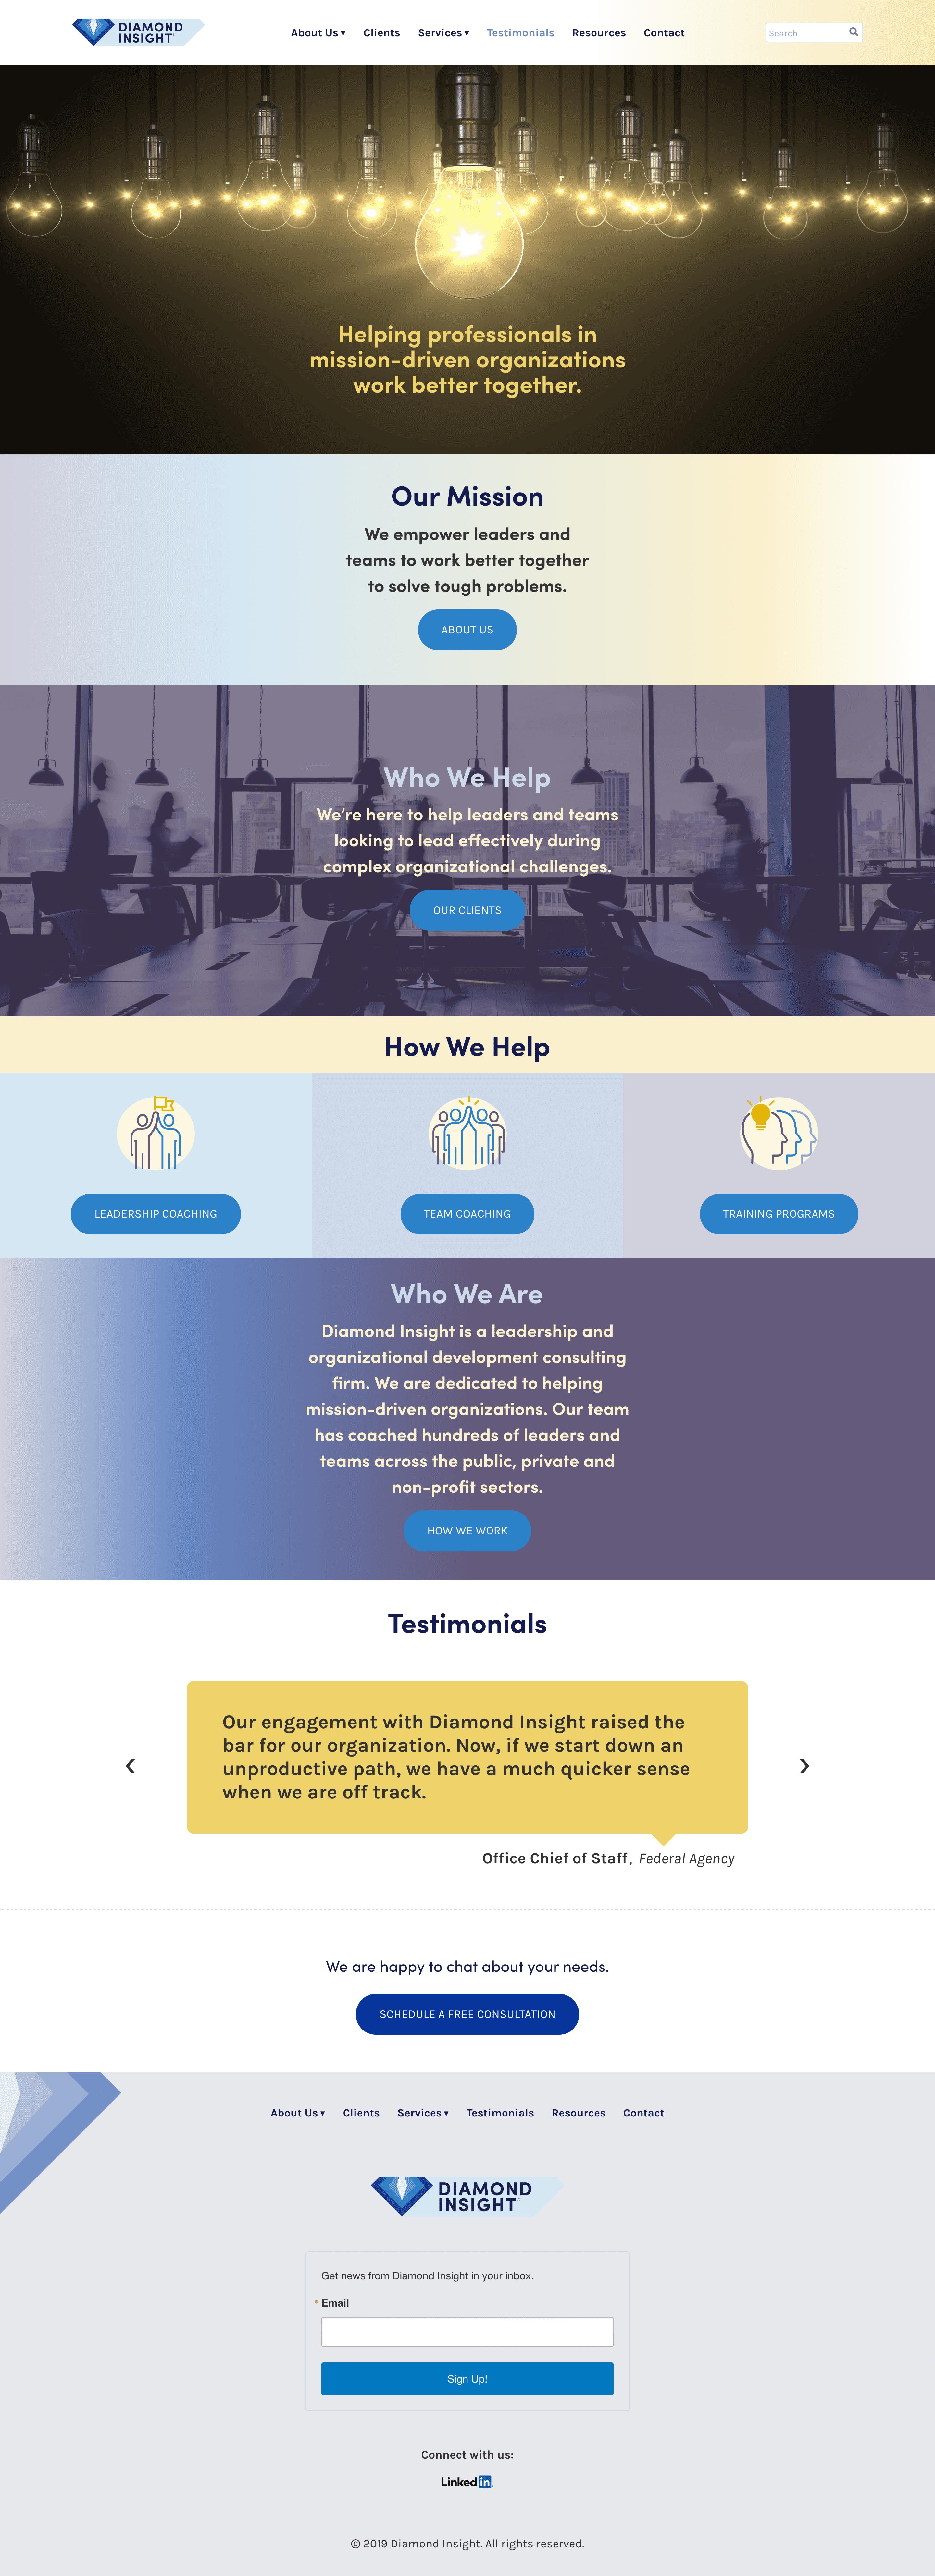 Diamond Insight home page screenshot